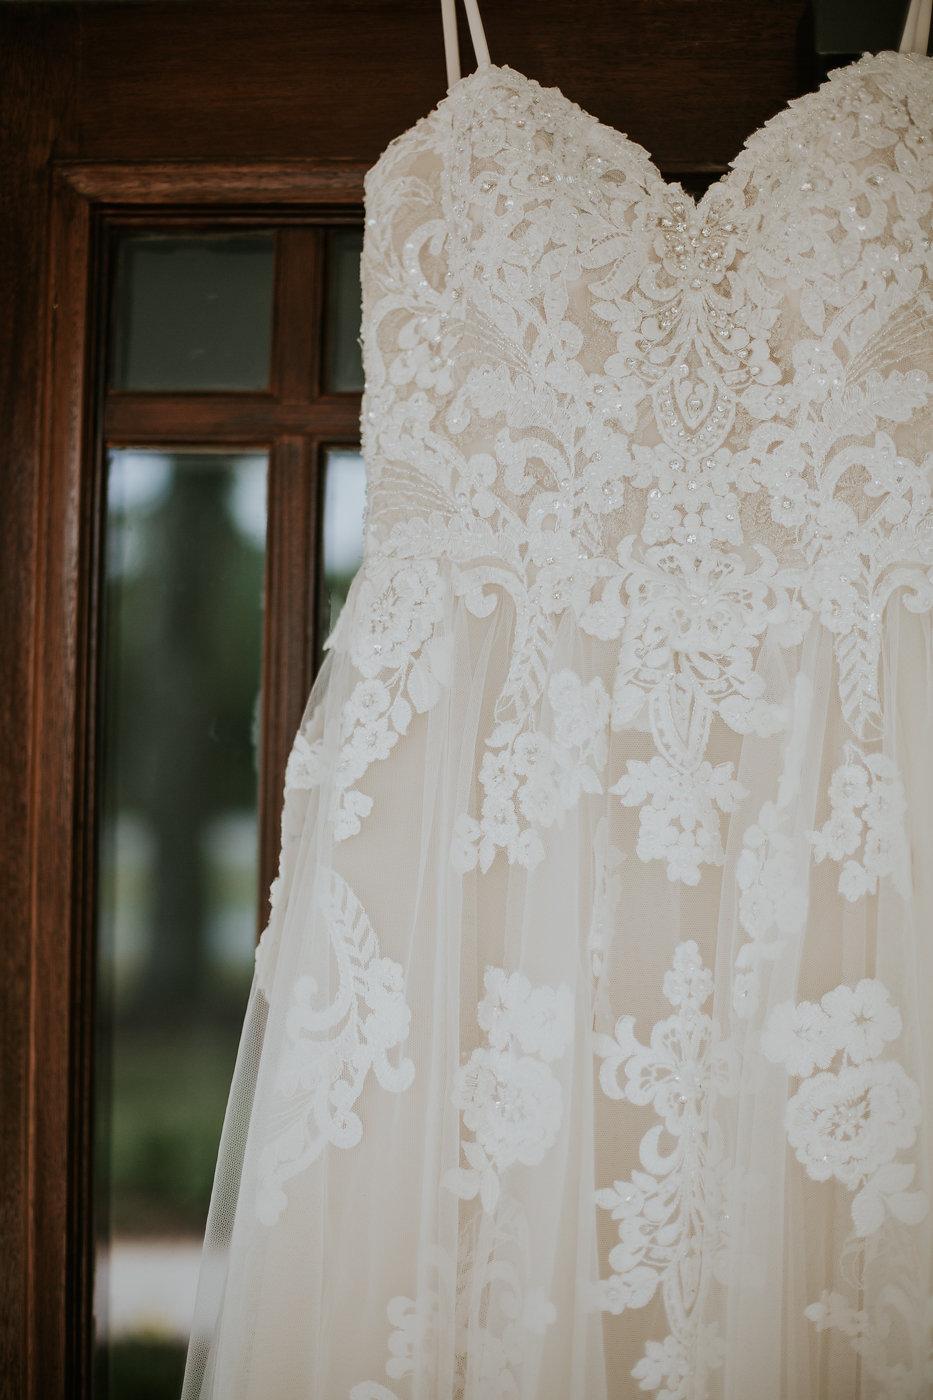 Beaded Embroidered Wedding Dress - North Carolina Wedding Venue - Triple J Manor House Wedding